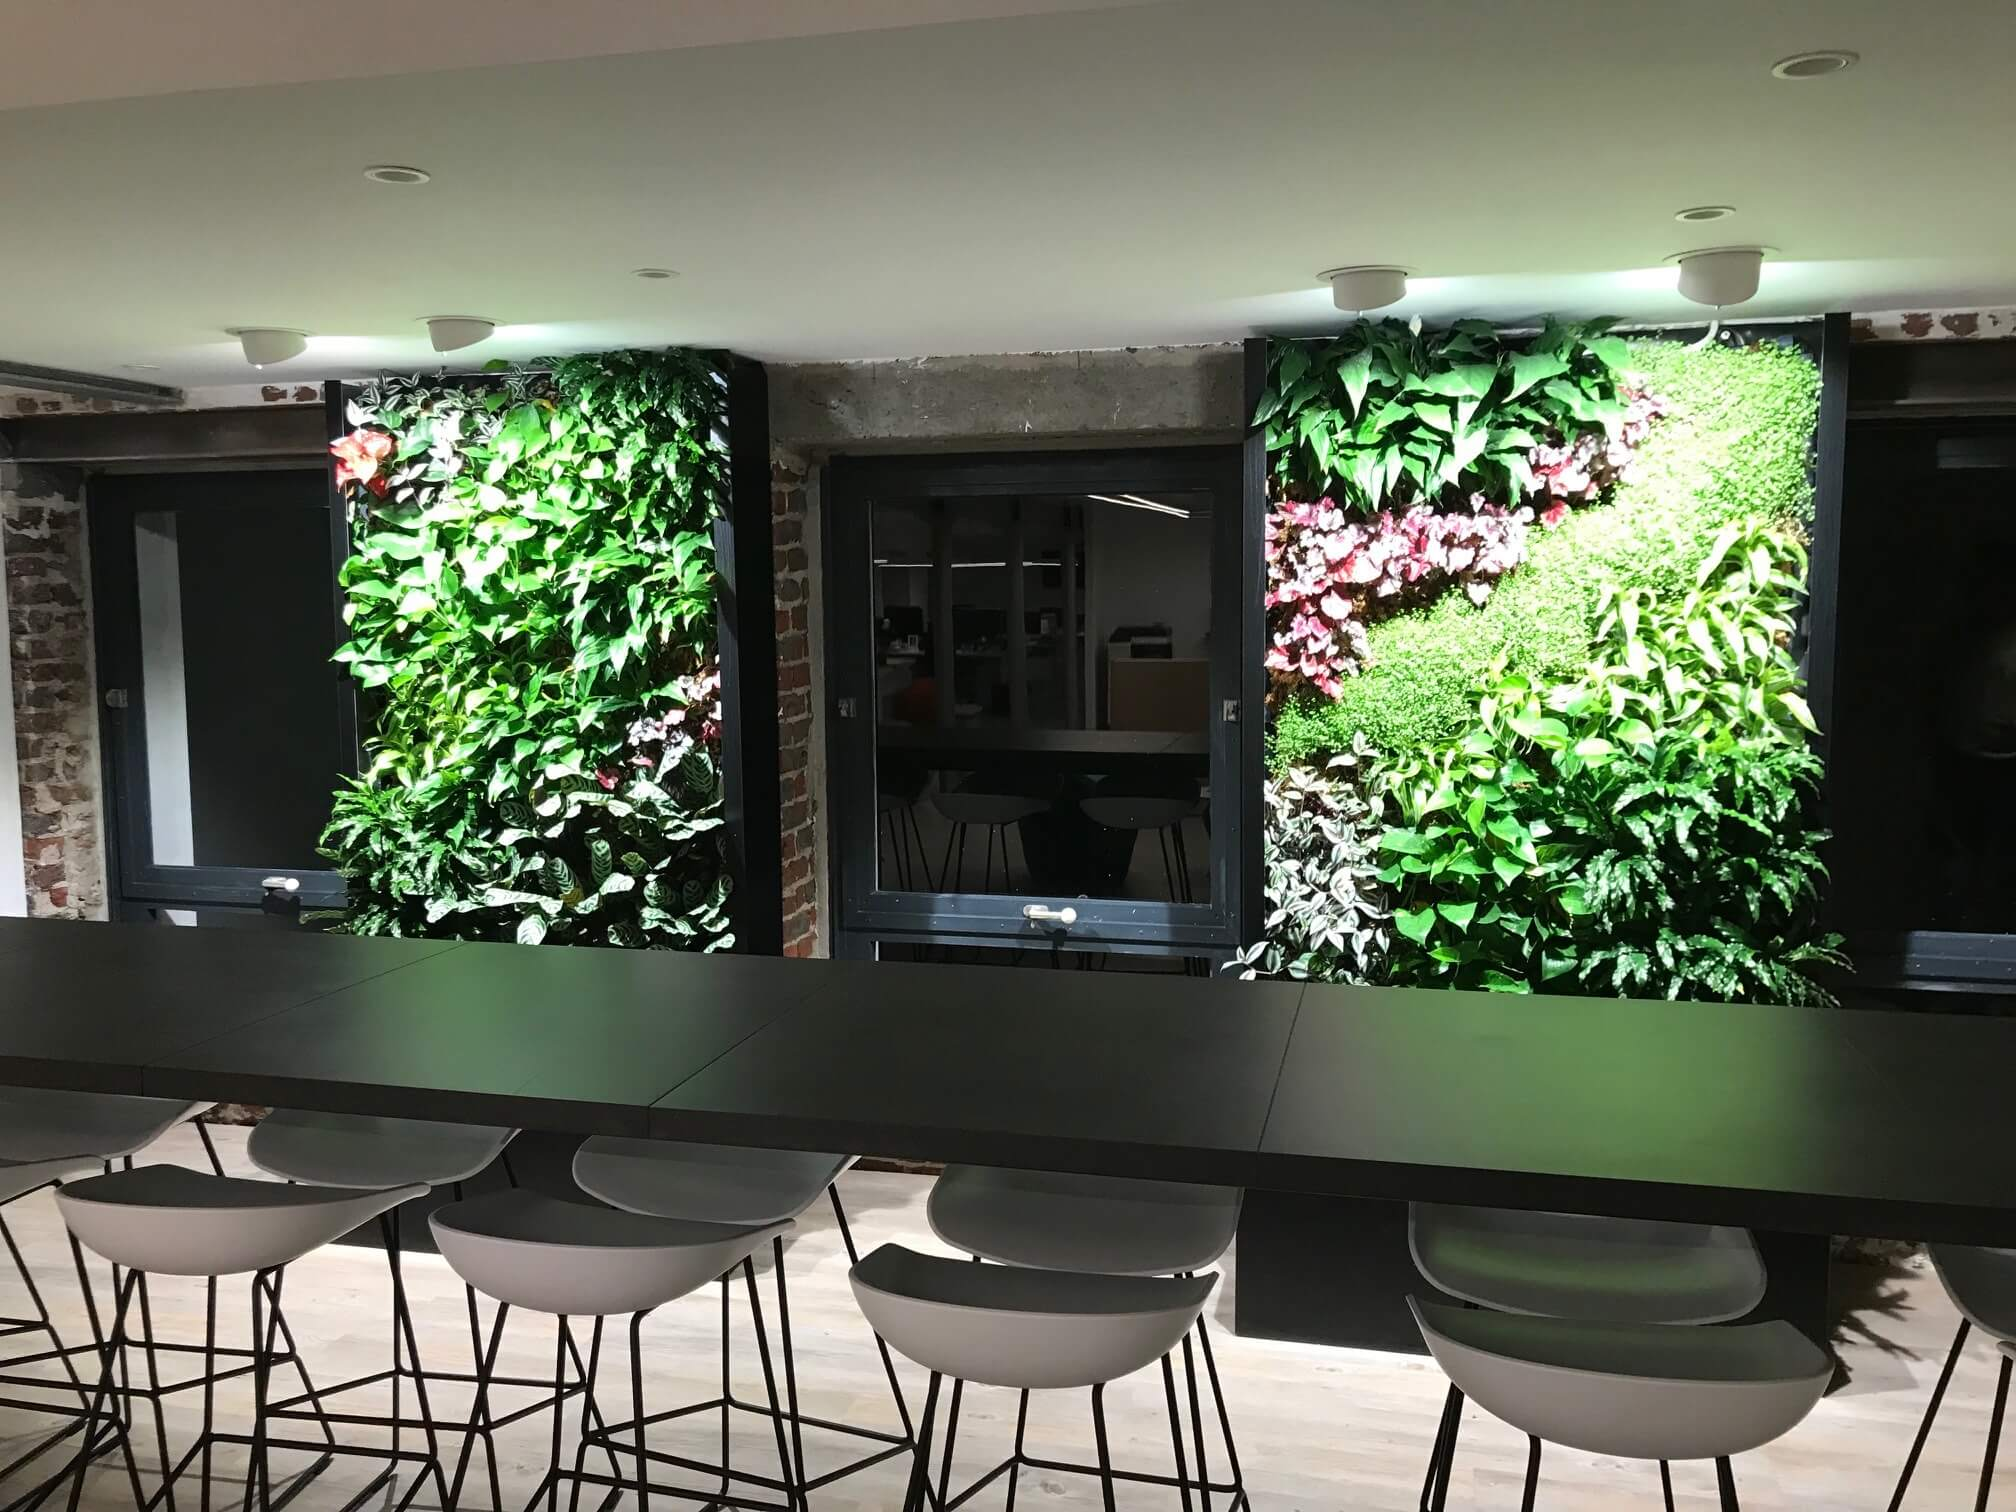 bureau-plants-galerie-electricite-vanhoyesprl